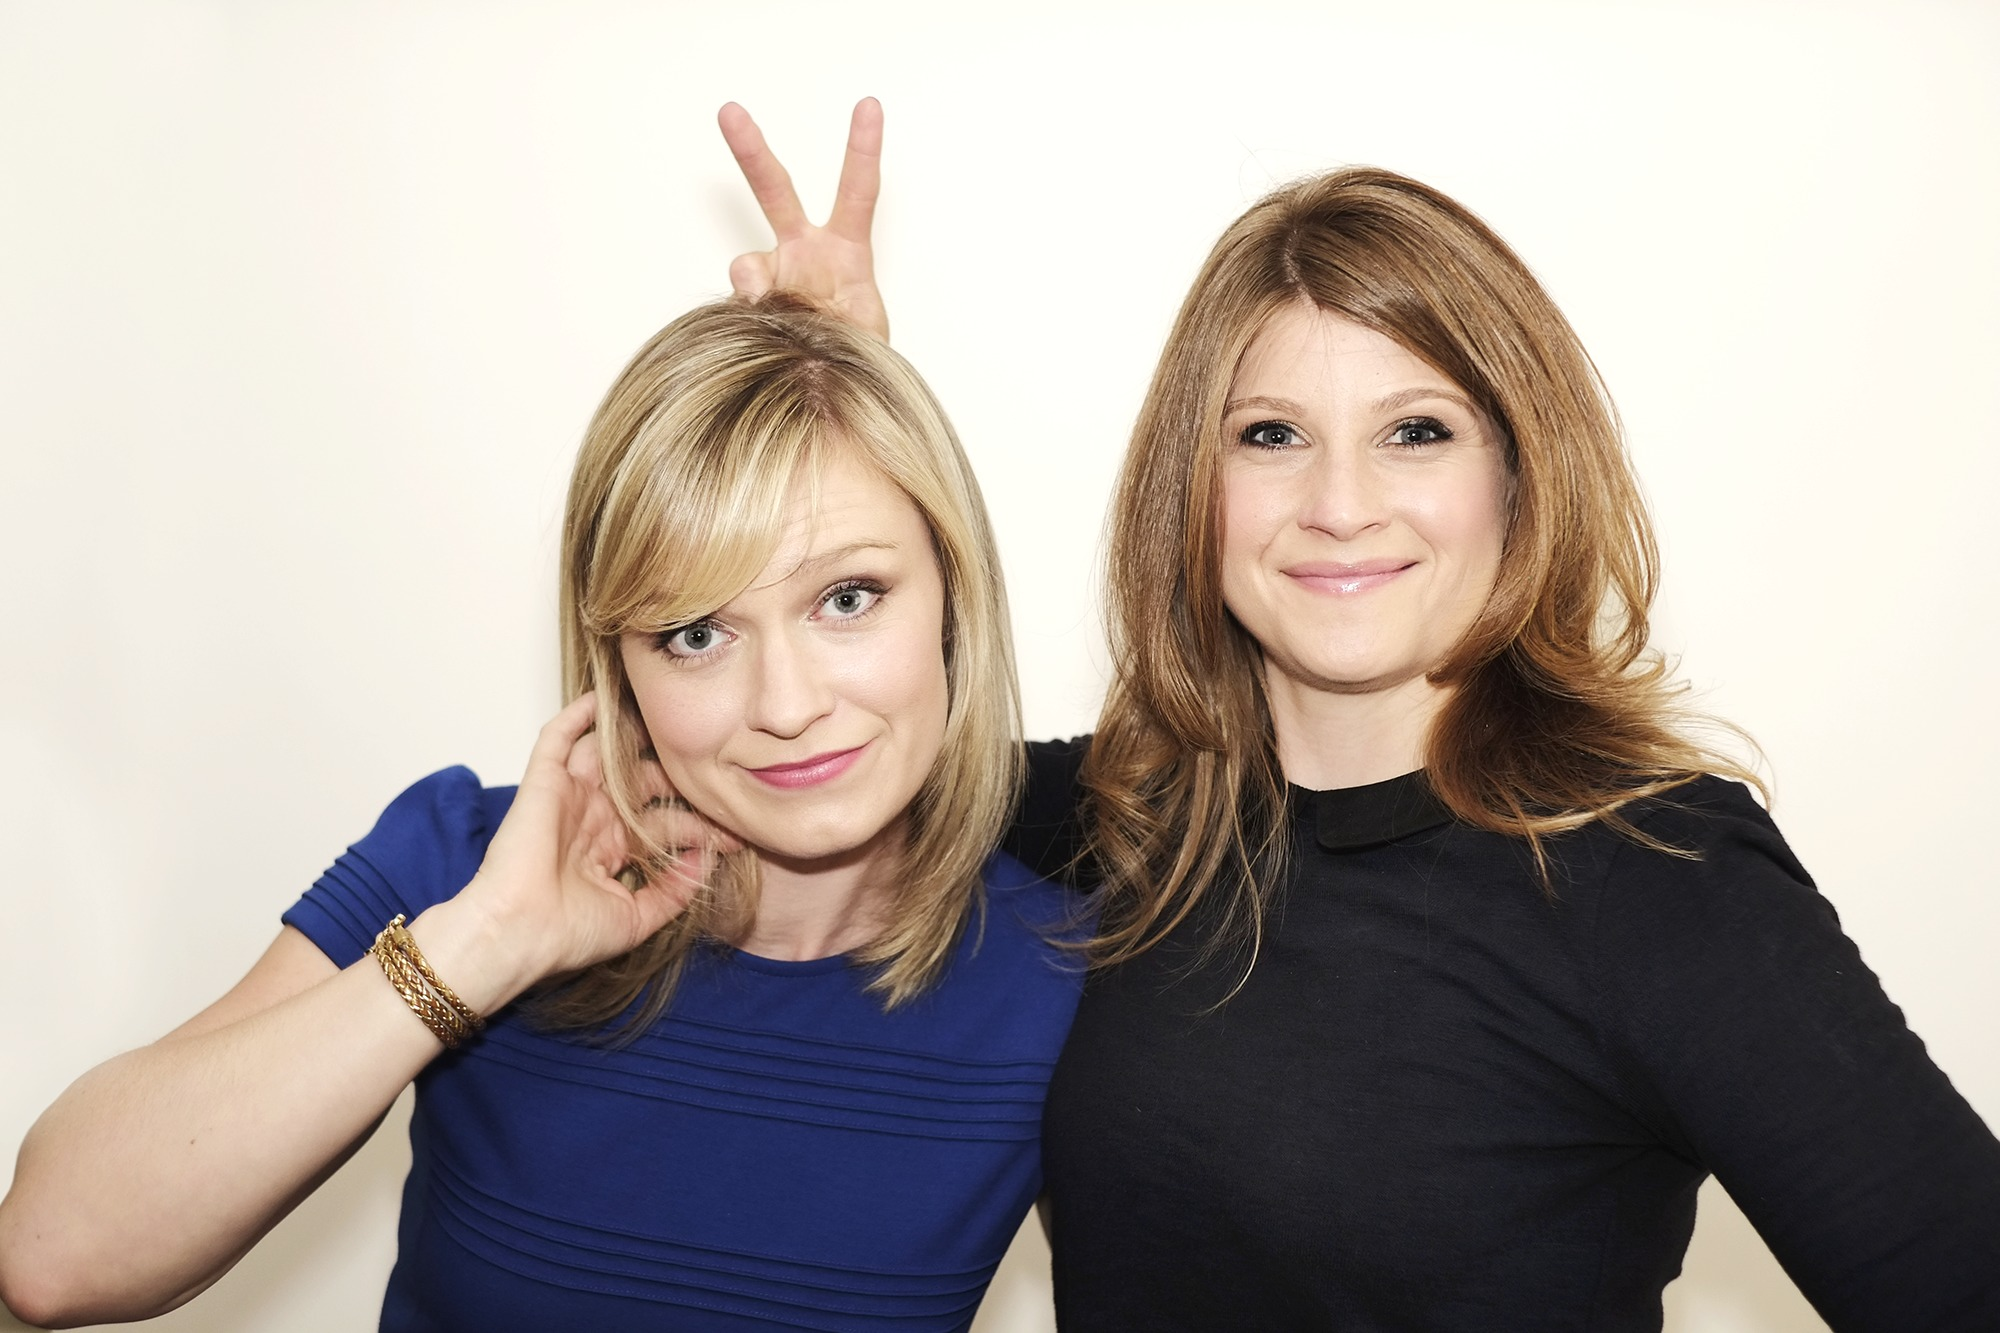 Katie Locke O'Brien and Claire Gerety-Mott, creators of THE HUB web series.